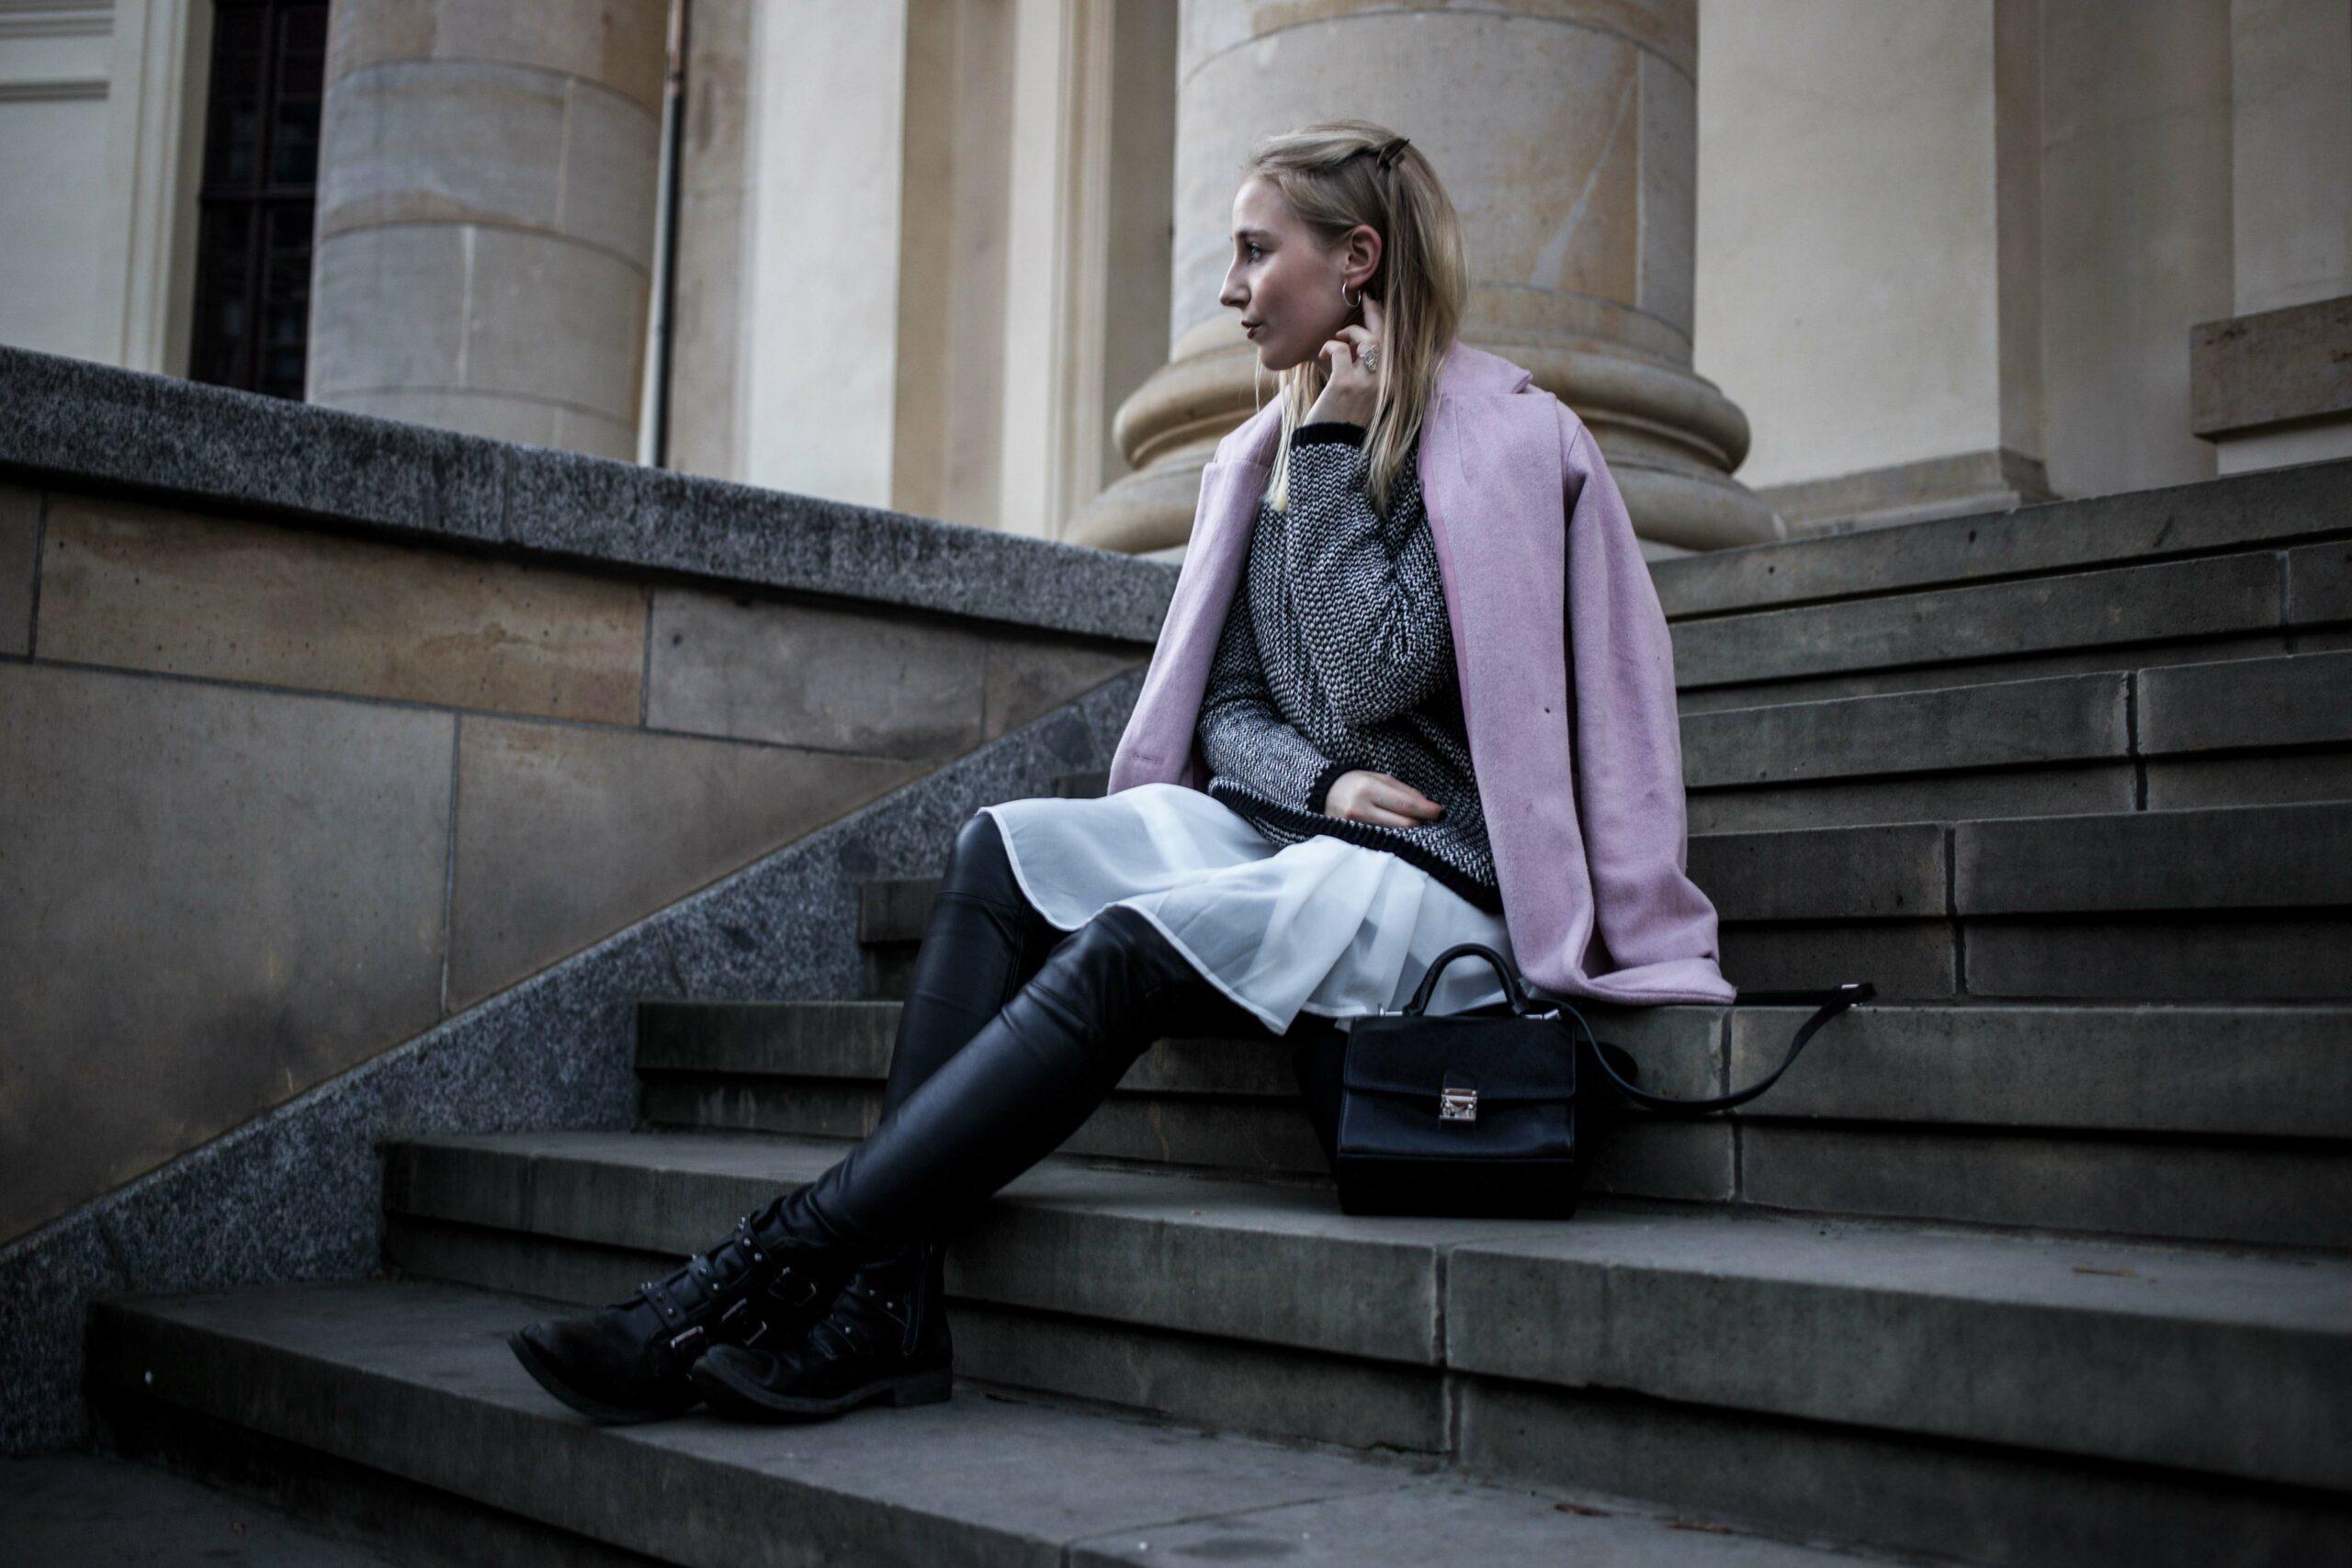 layering-outfit-biker-lederhose-thomas-sabo-schmuck-winter-outfit-berlin-fashionblog-modeblog_7455